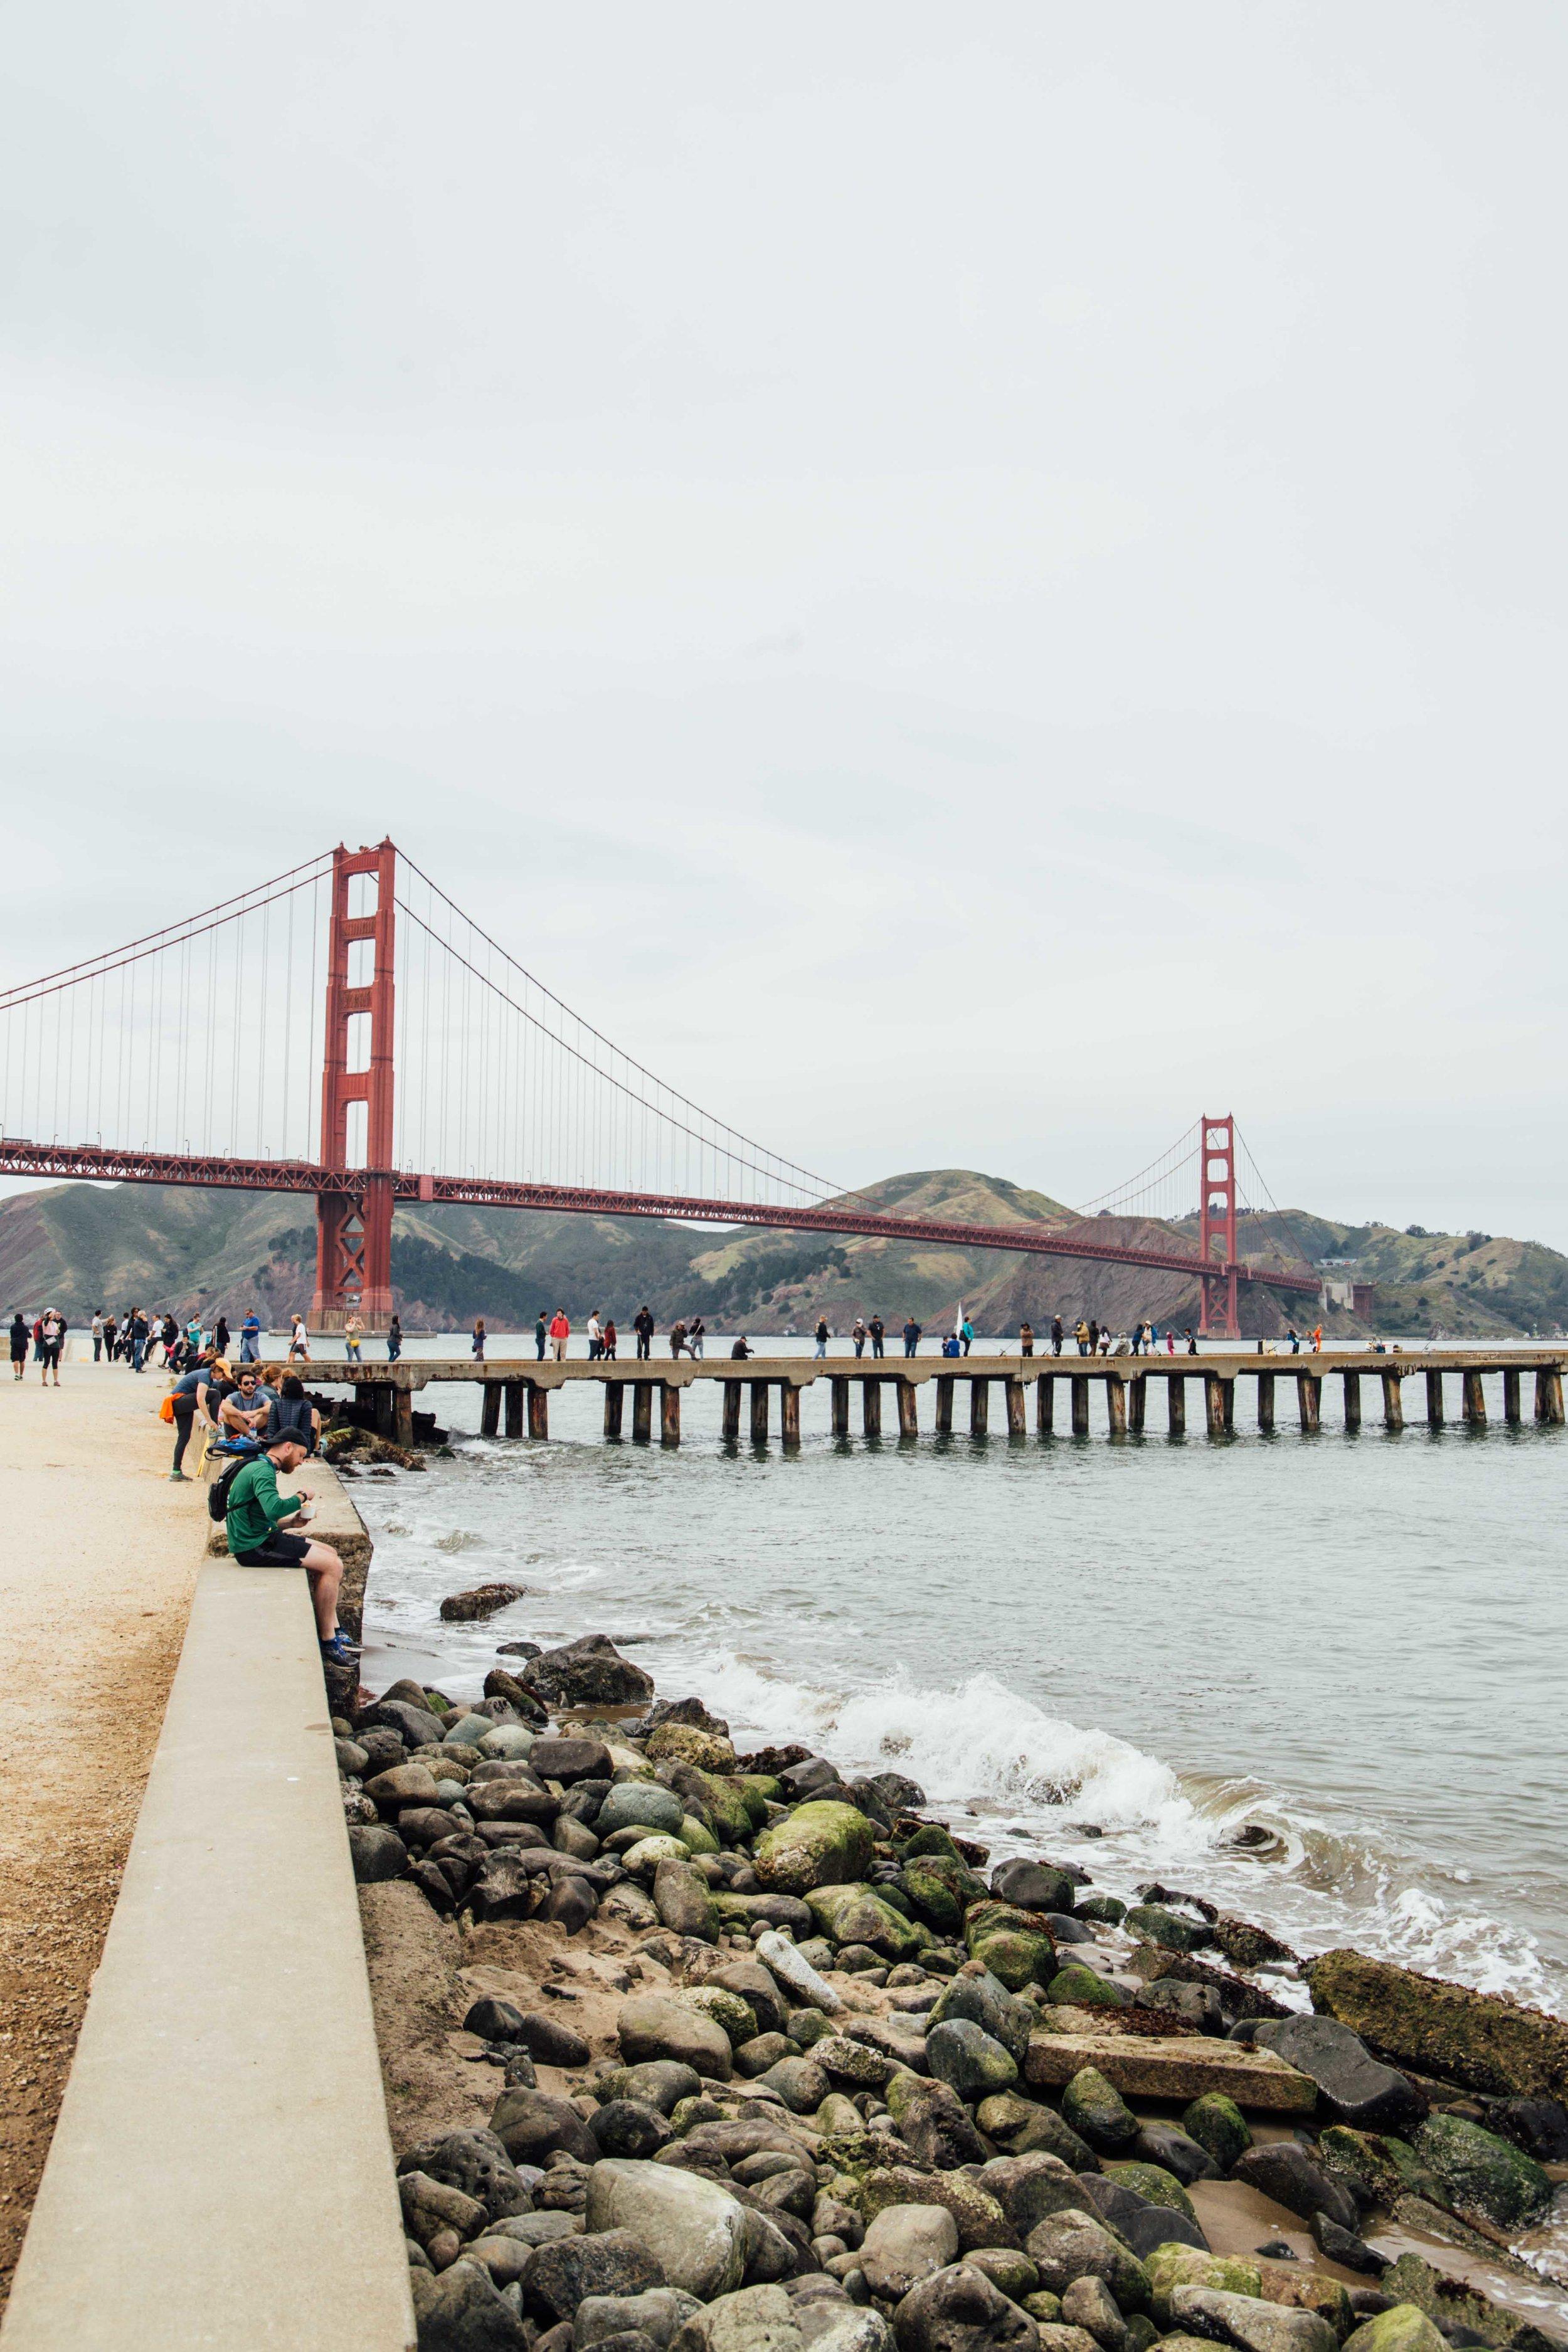 Walk to the Golden Gate Bridge. Photo: Marine Raynard